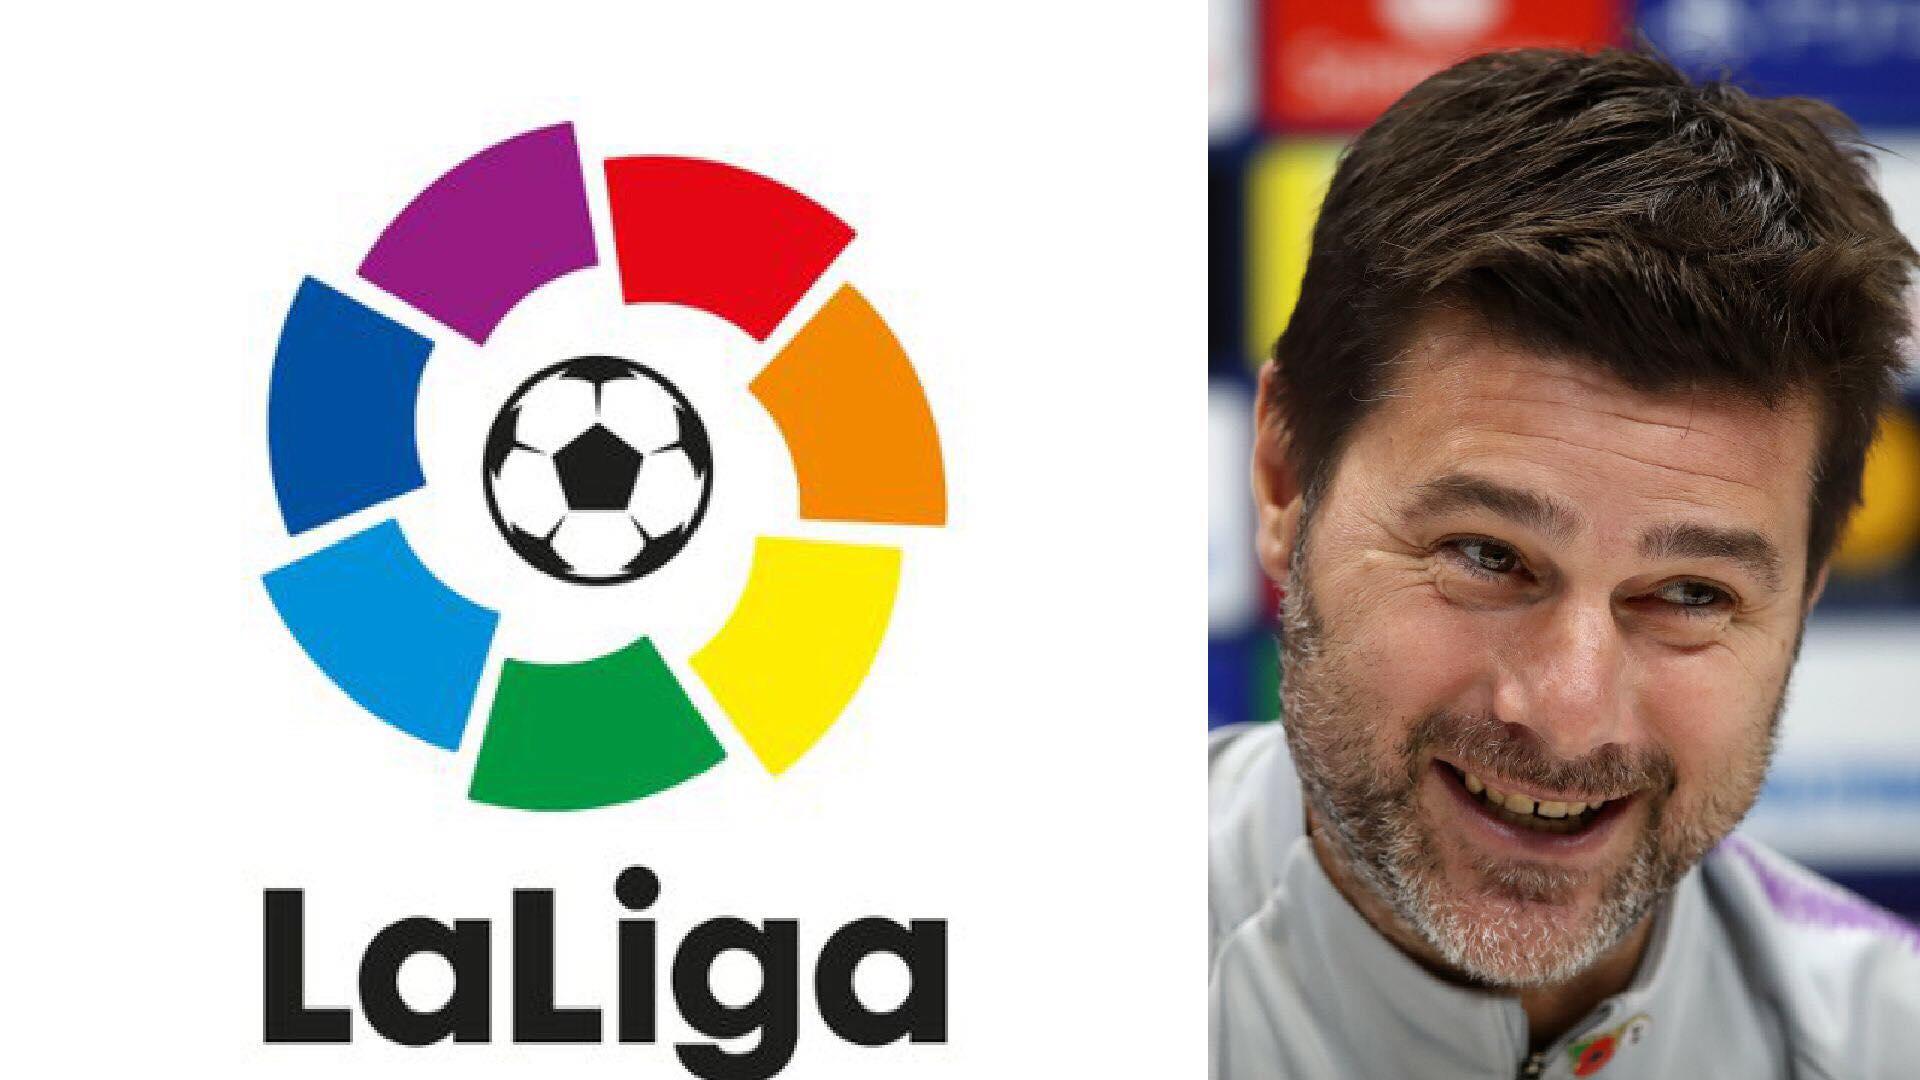 La Liga Keeper Set For Premier League Switch